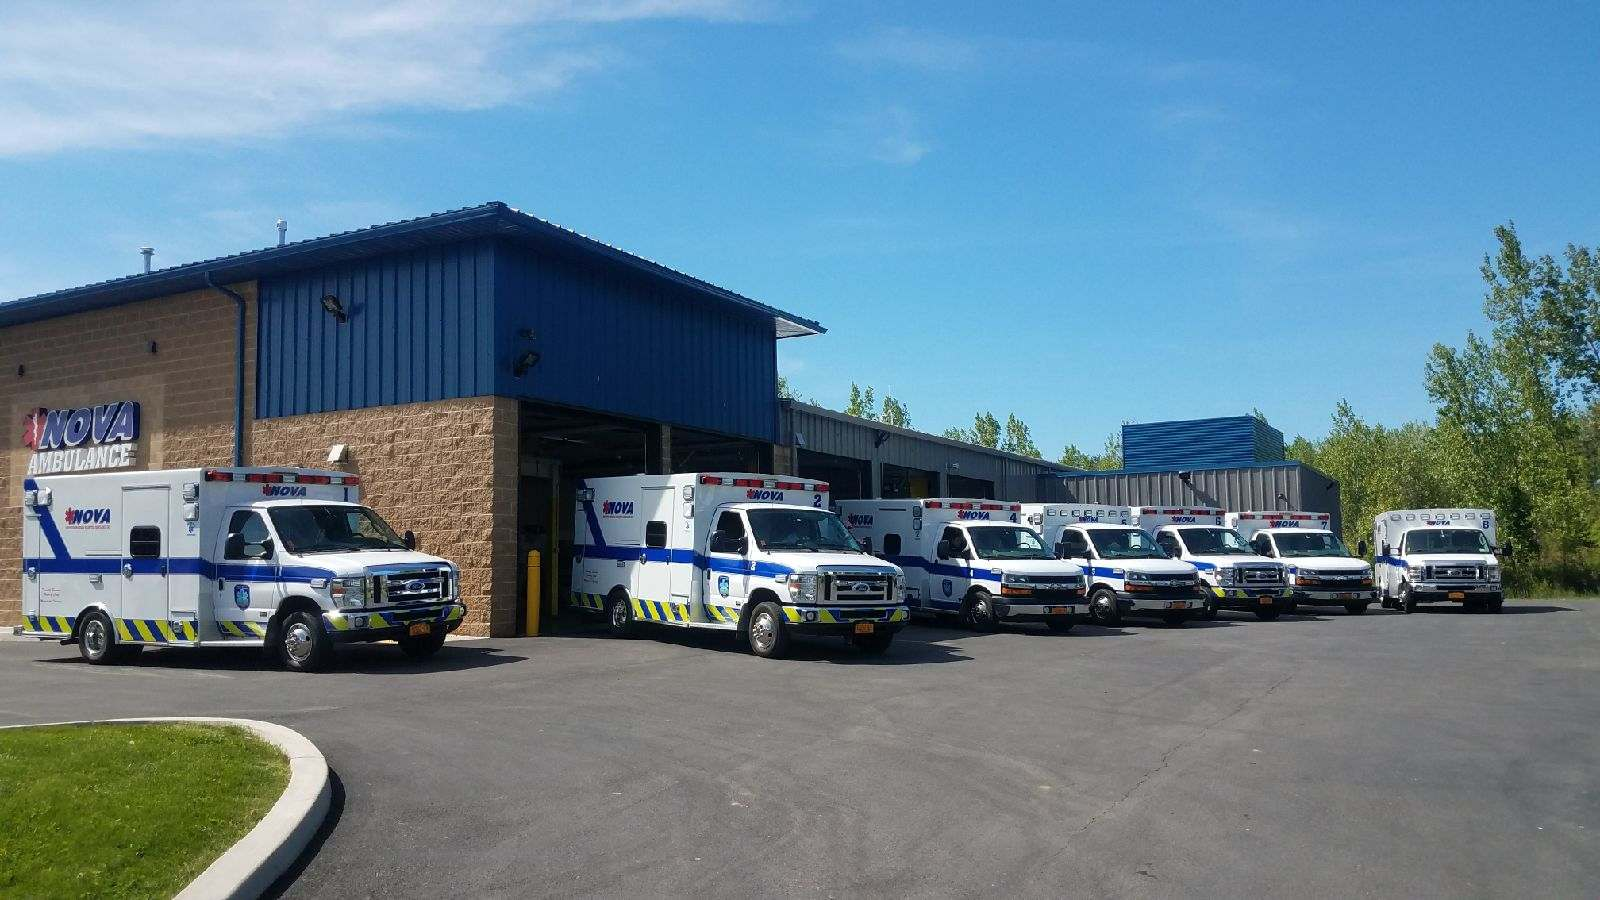 Northern Onondaga Volunteer Ambulance, Inc